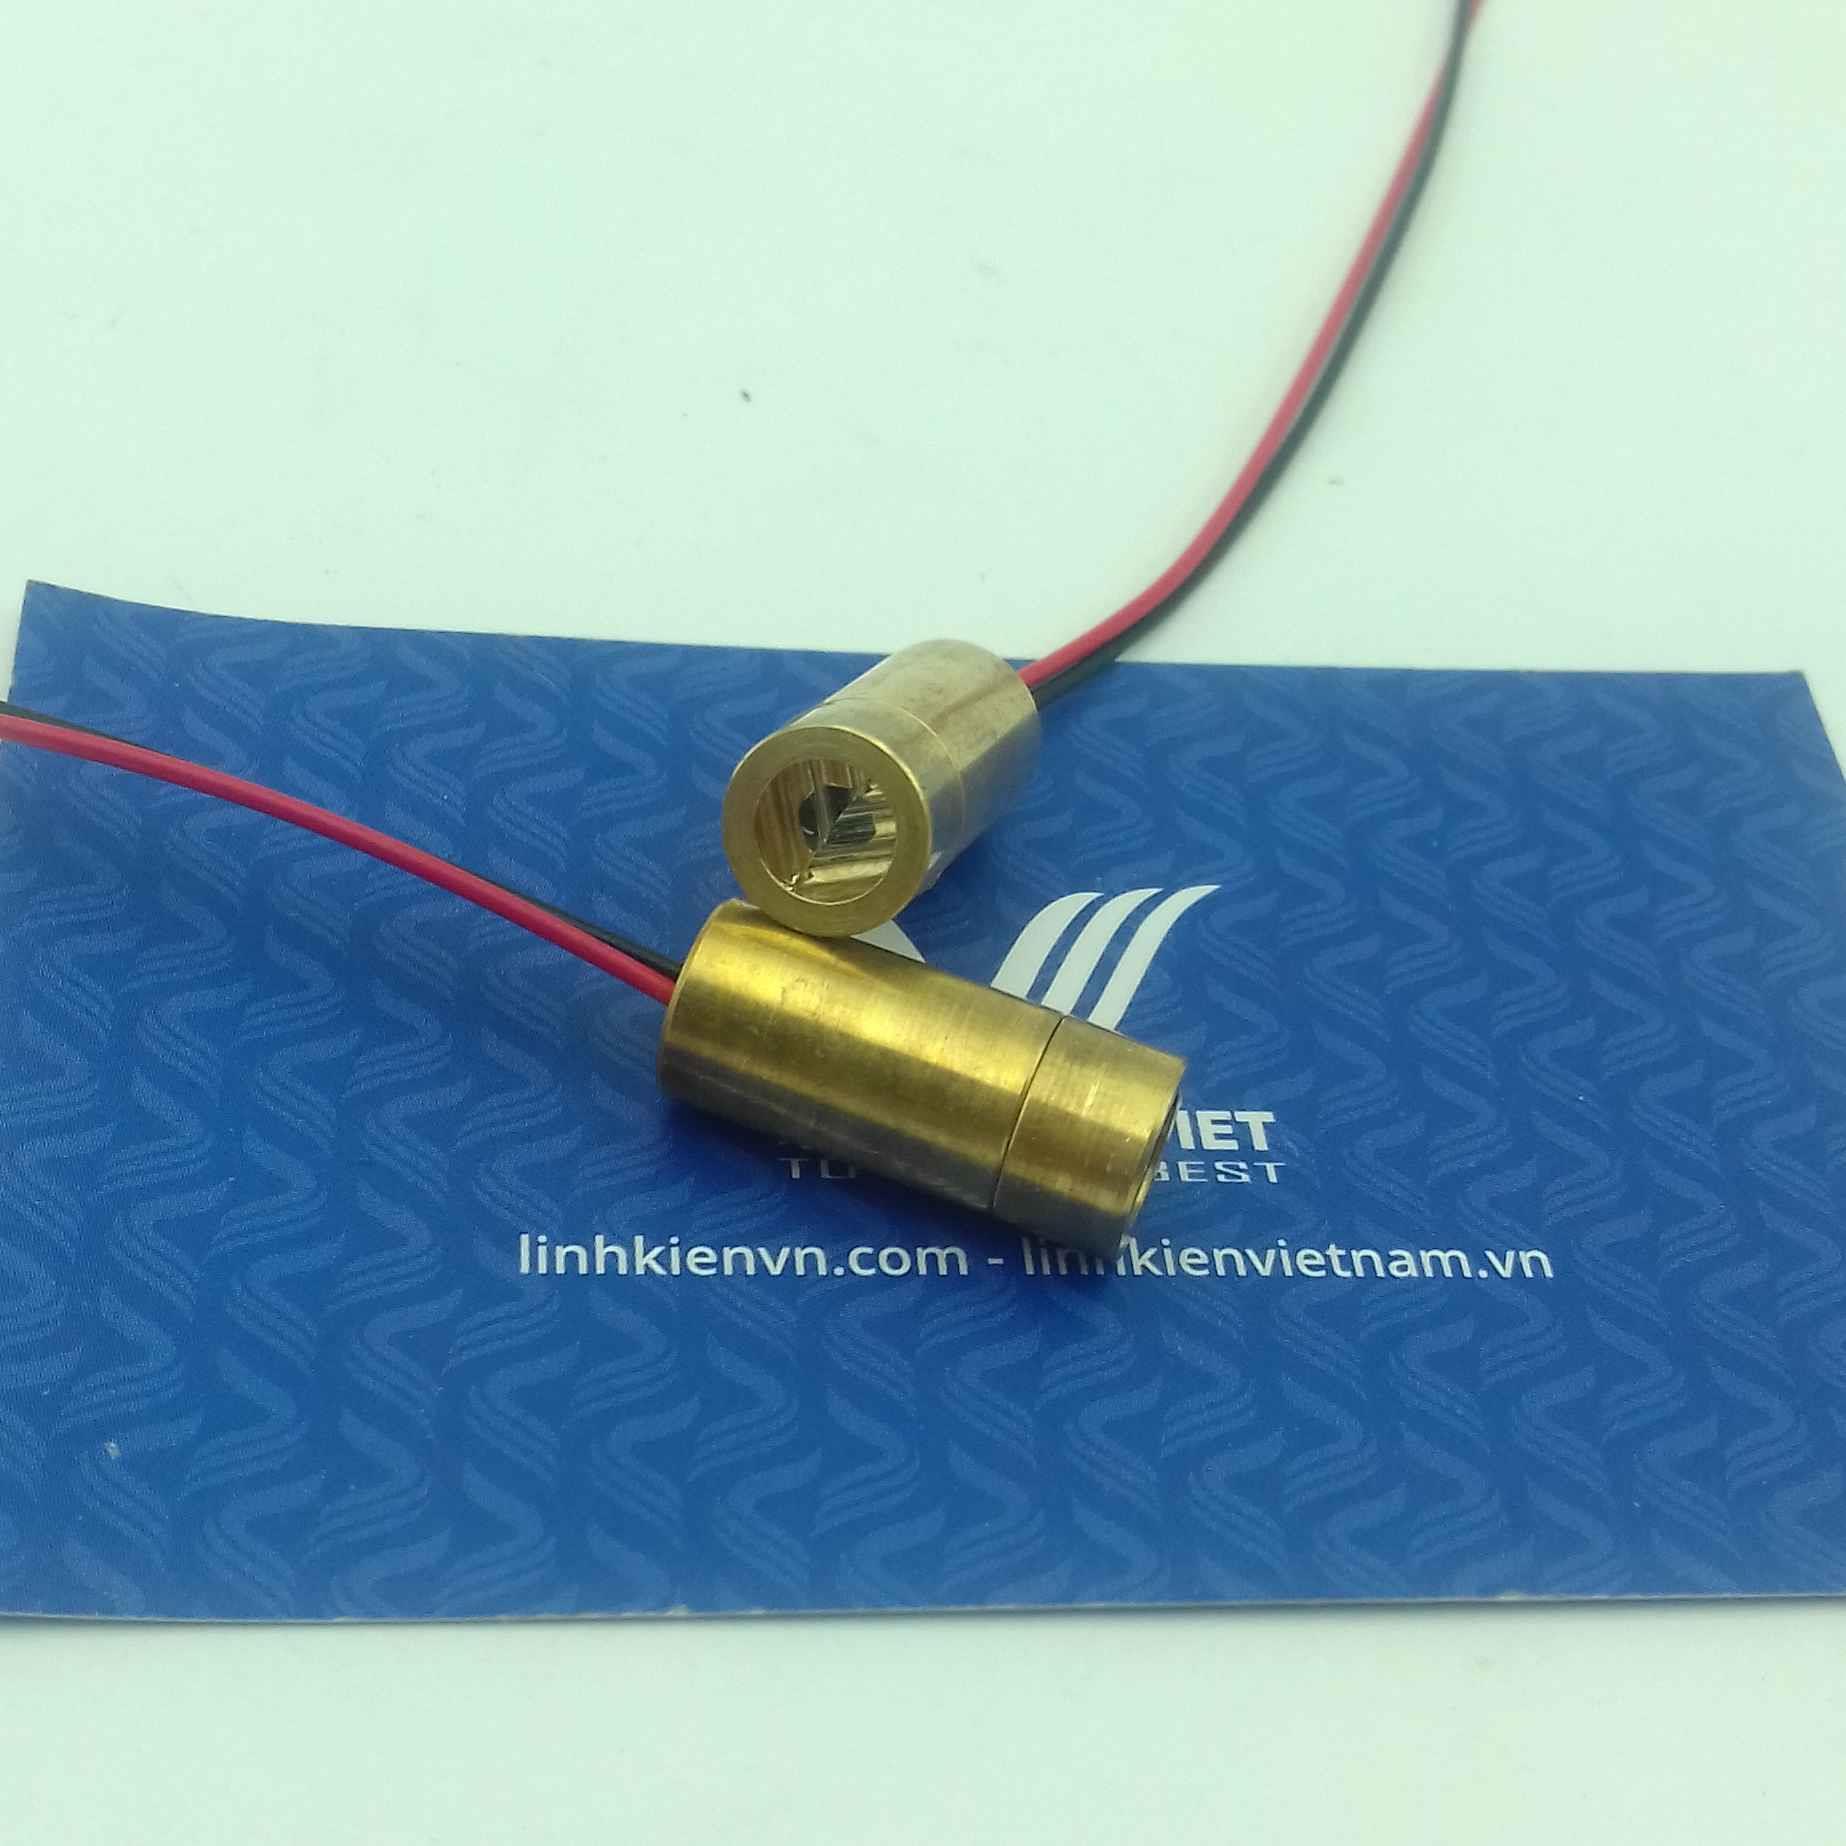 ĐÈN LED LASER 3V 9mm chữ thập - J3H3